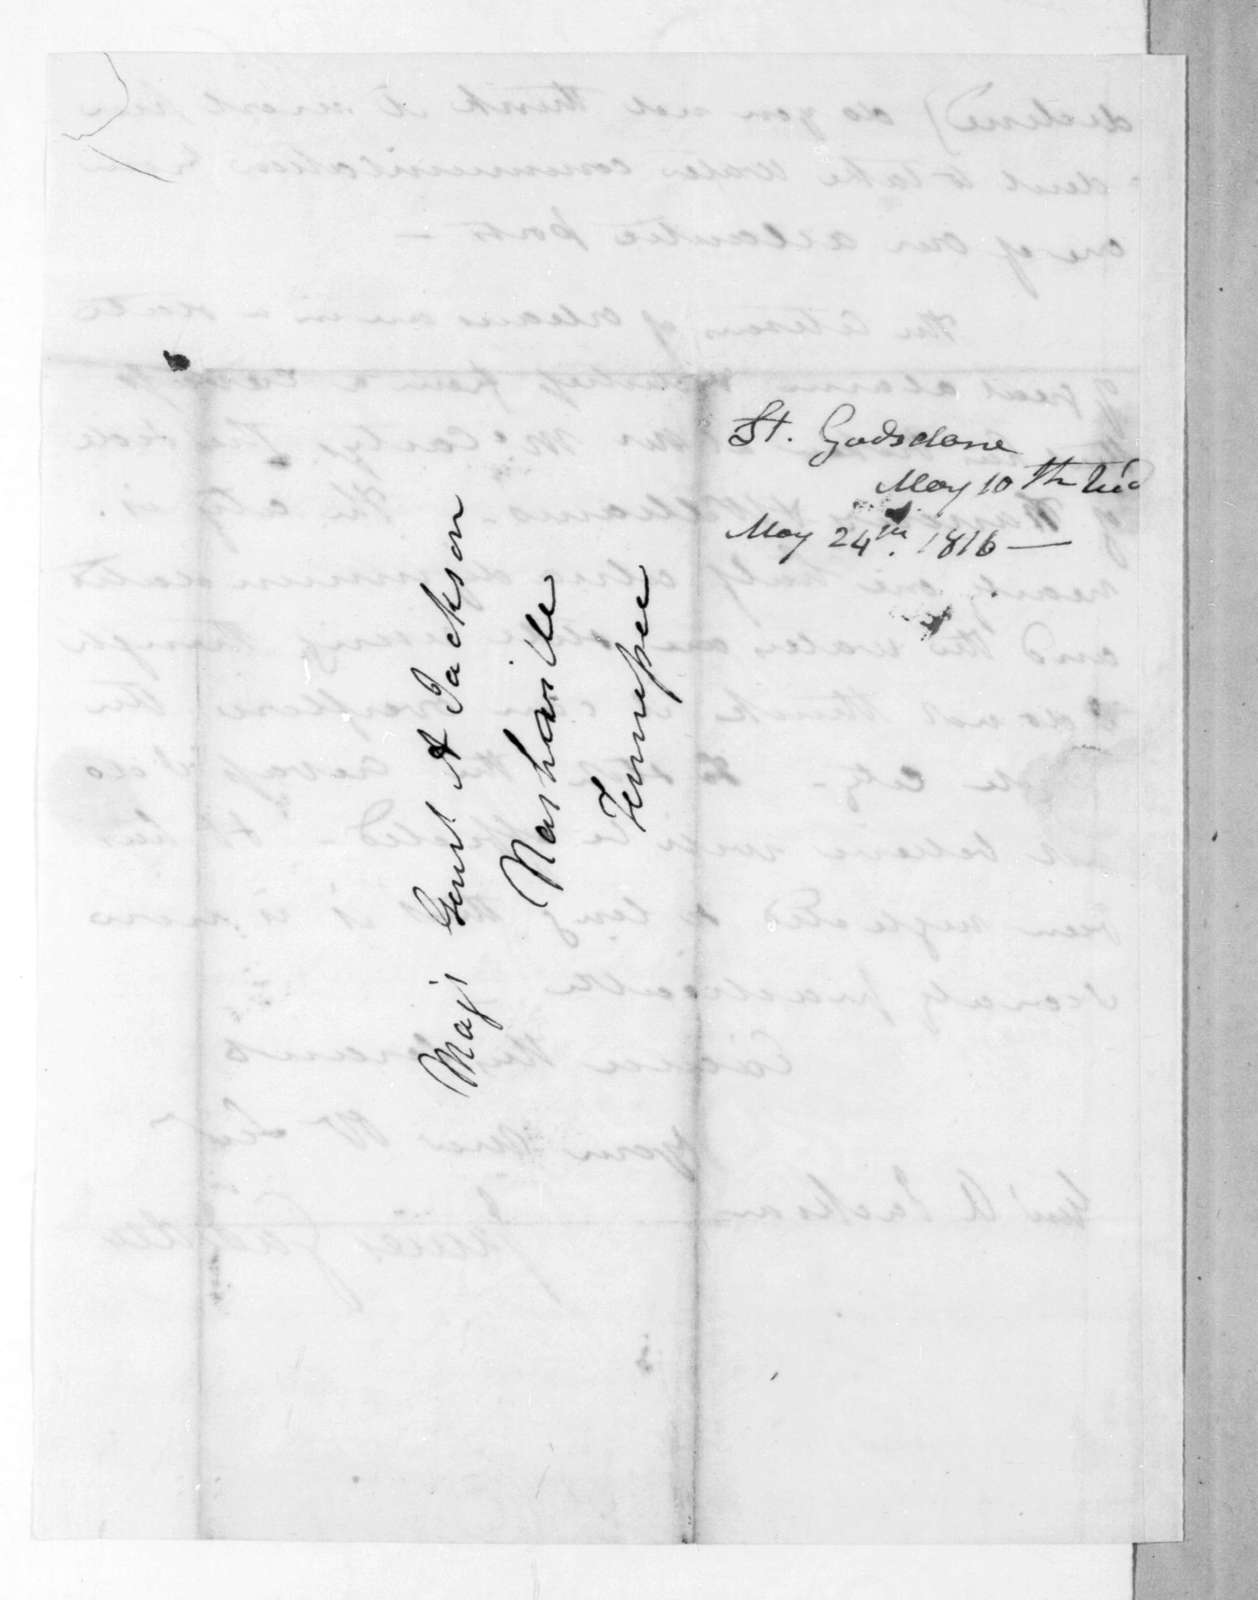 James Gadsden to Andrew Jackson, May 10, 1816